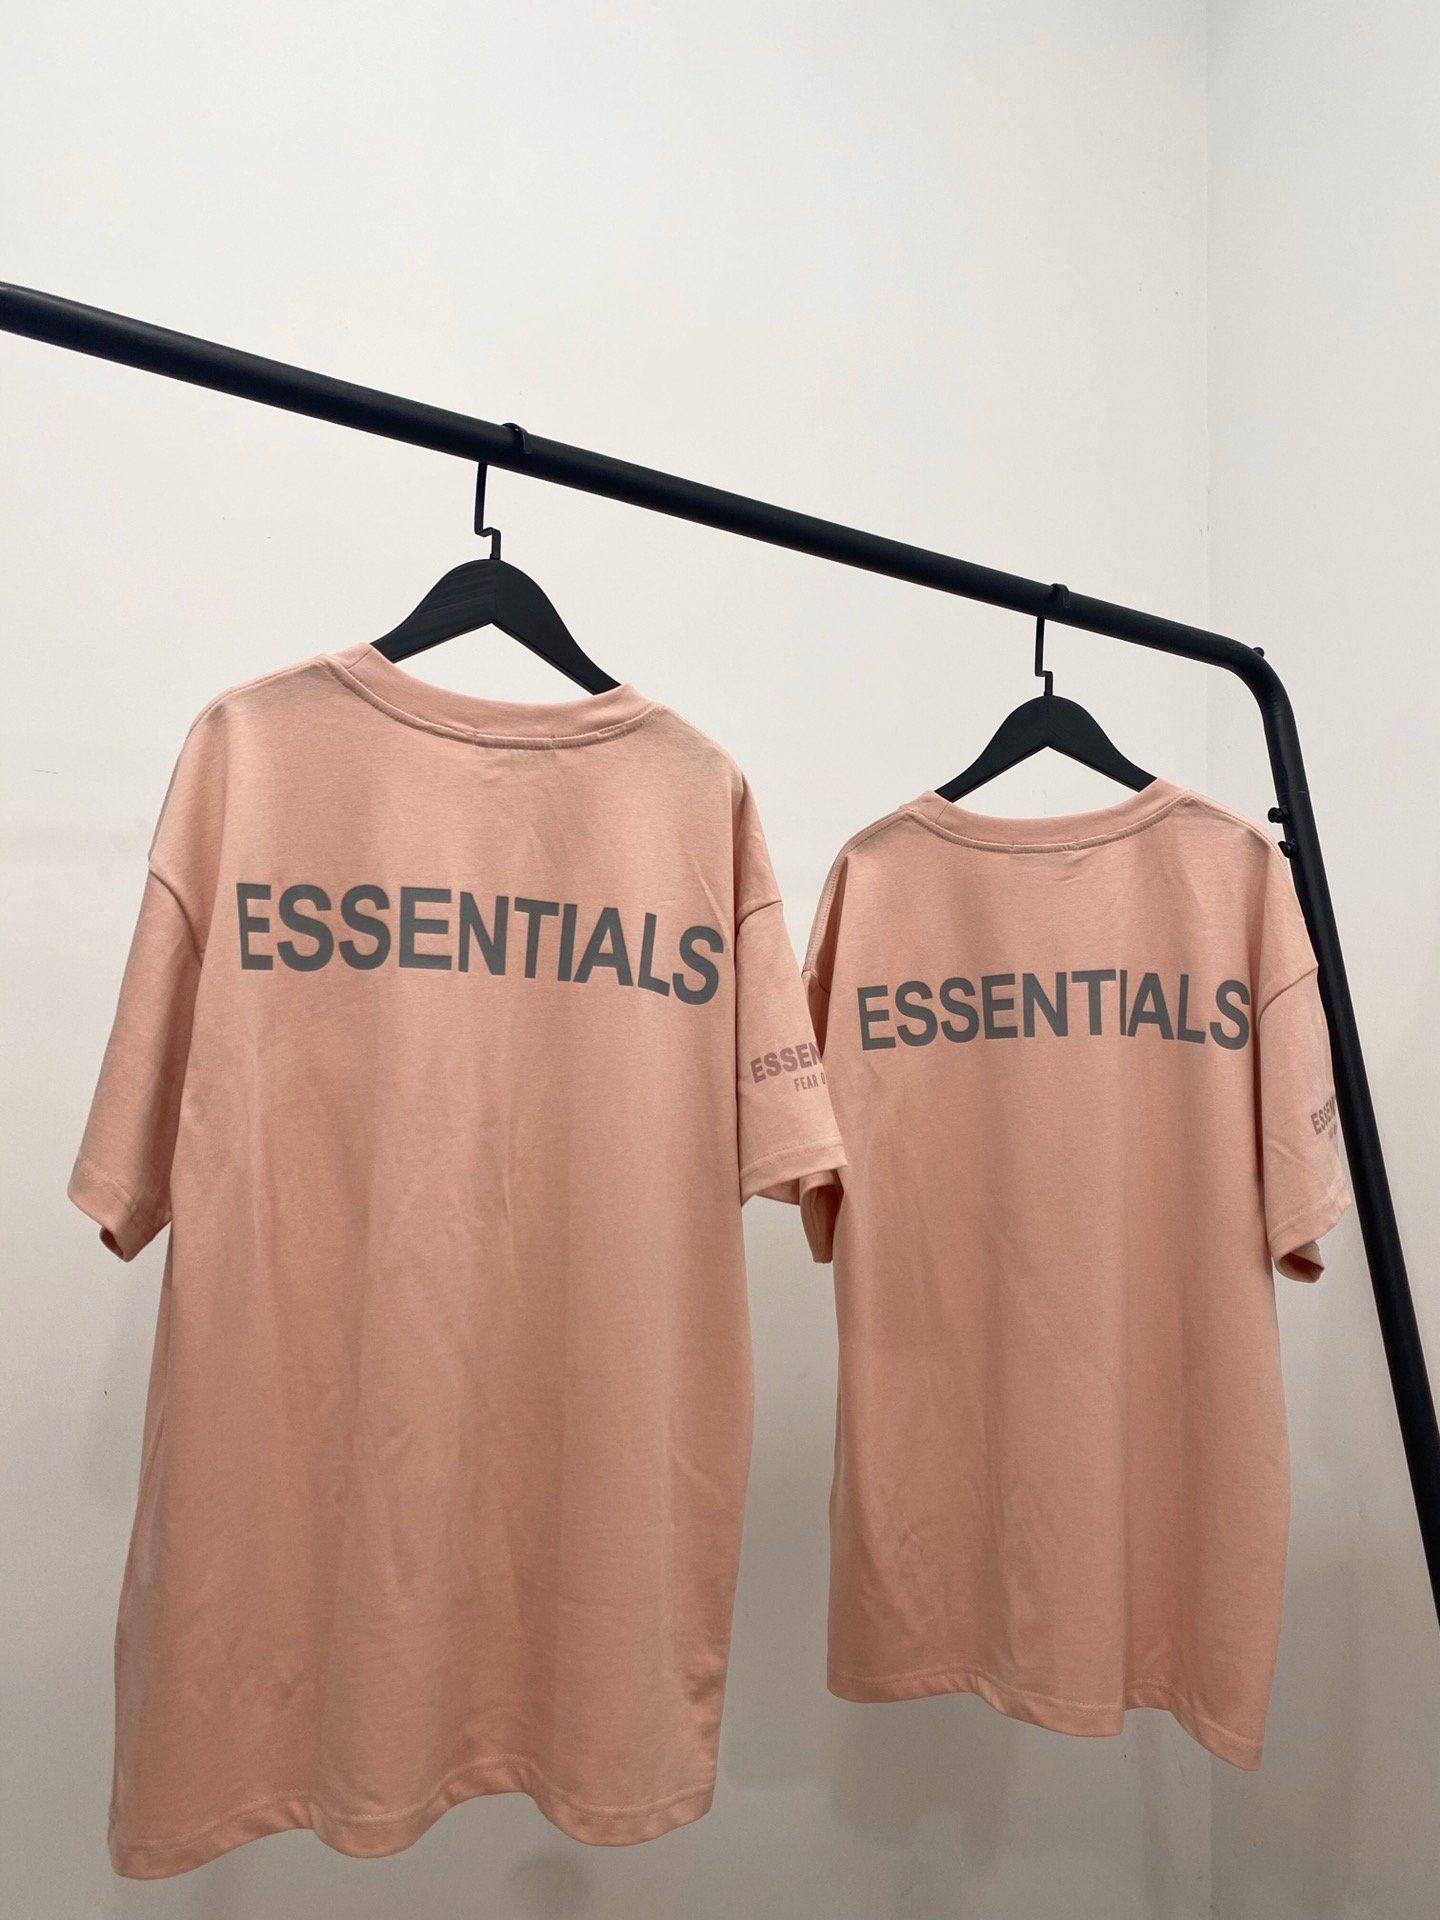 Free Shipping Brand Shirt Hot Seller Designer Women Mens T-shirt Fashion Casual Spring Summer Tees Good Quality Luxury Girl Tshirt 20022241Y